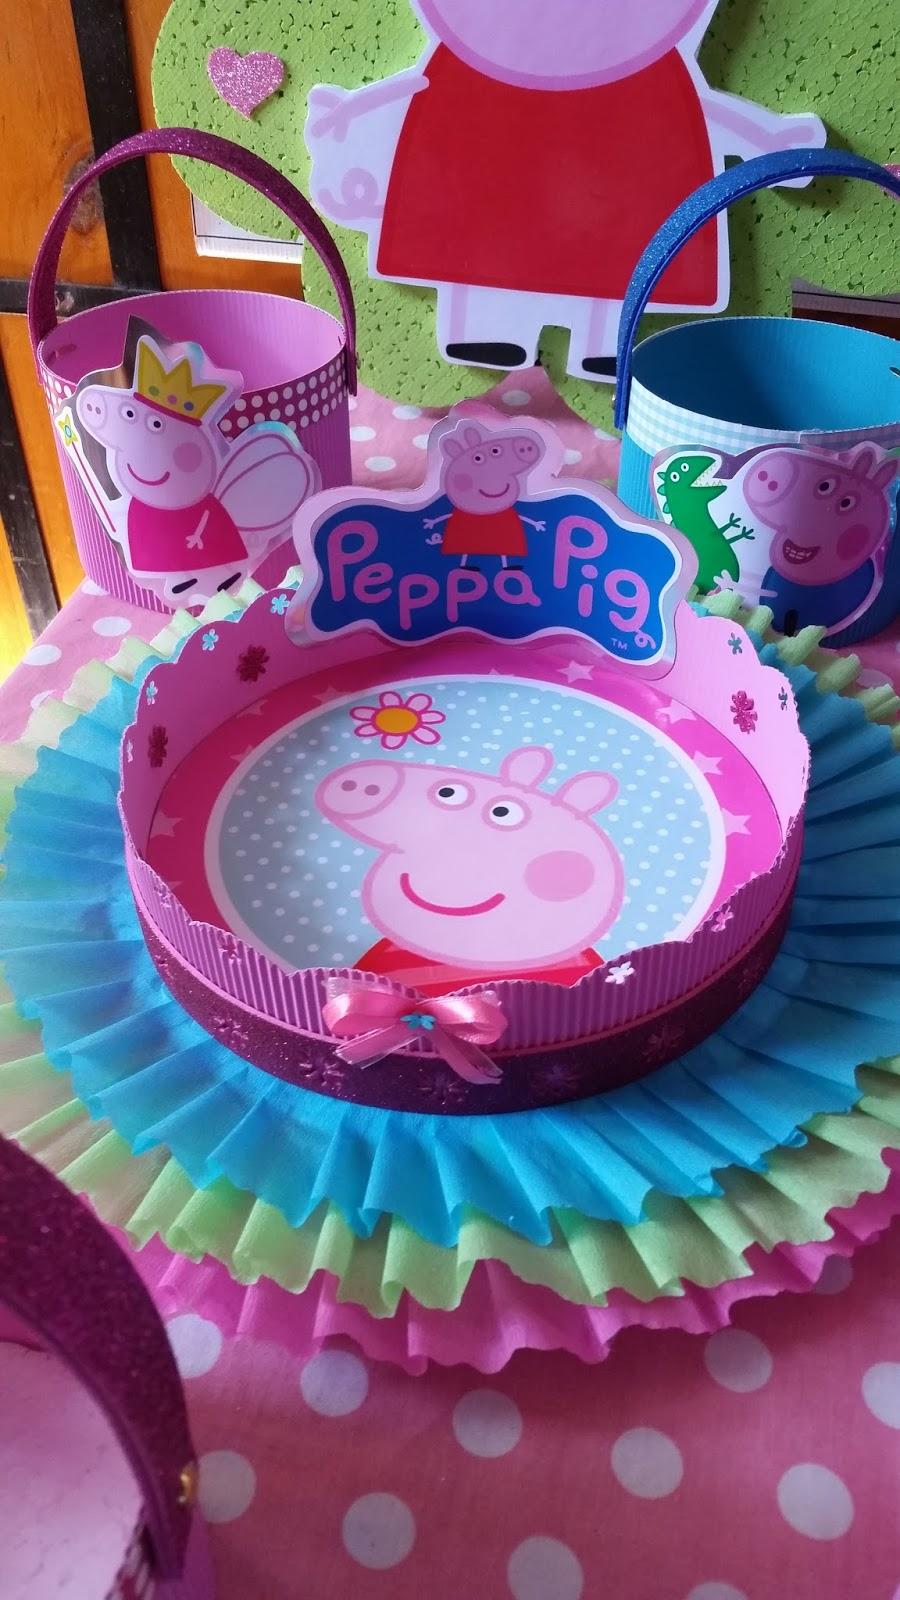 Decoraciones infantiles peppa pig - Decoracion de cumpleanos infantiles ...